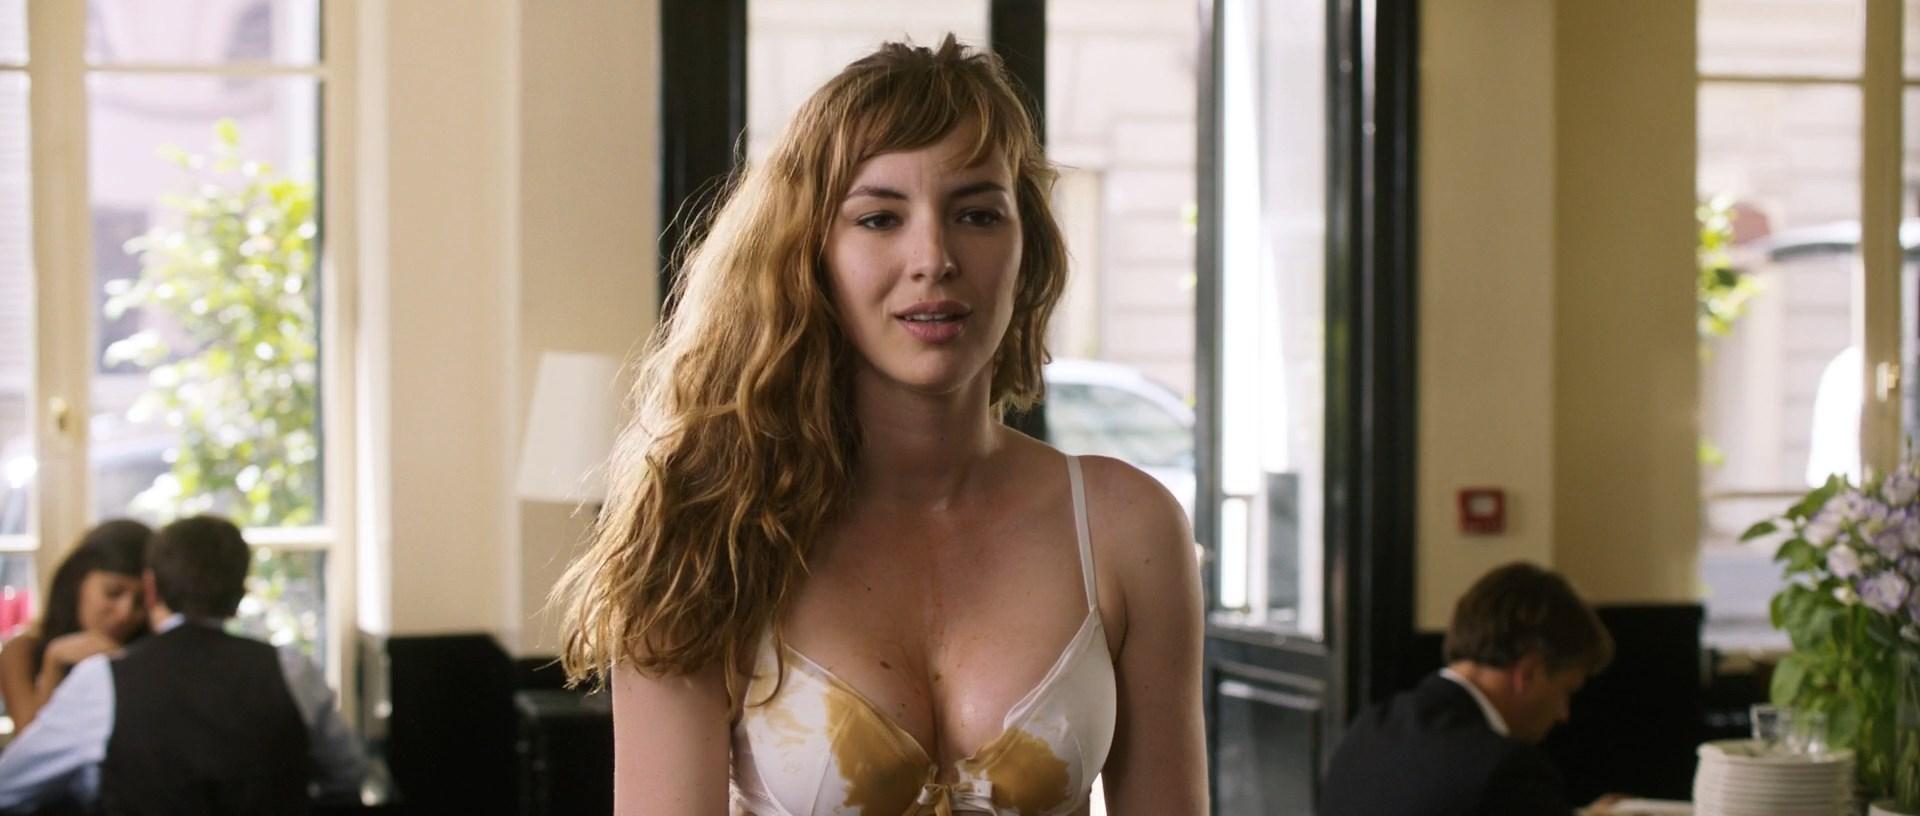 Louise Bourgoin Nude Photos Leaked Online - Mediamass